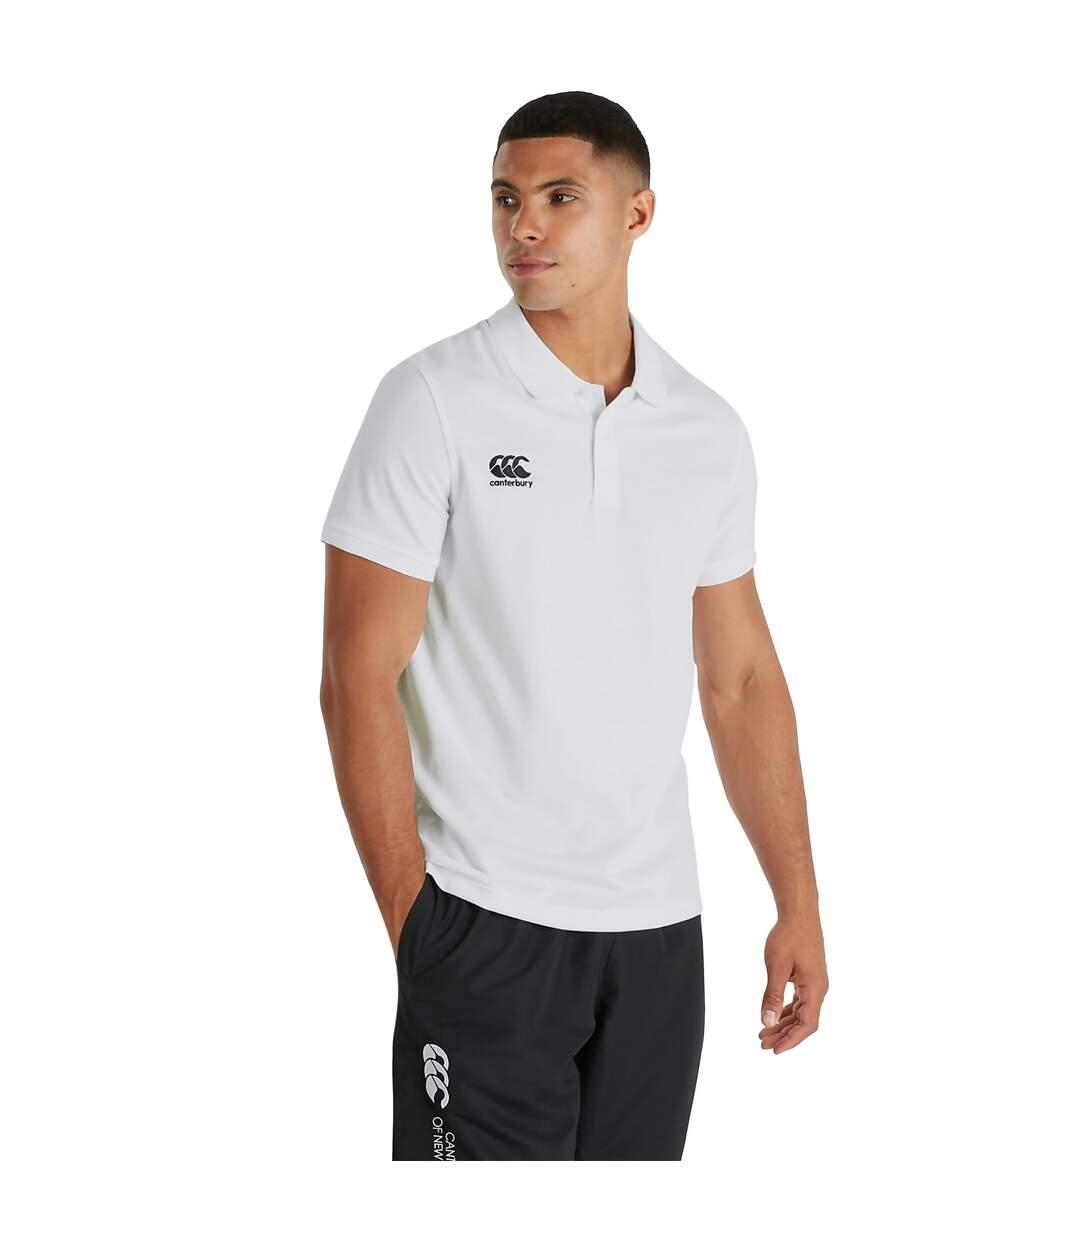 Canterbury Mens Waimak Short Sleeve Pique Polo Shirt (White) - UTPC2463